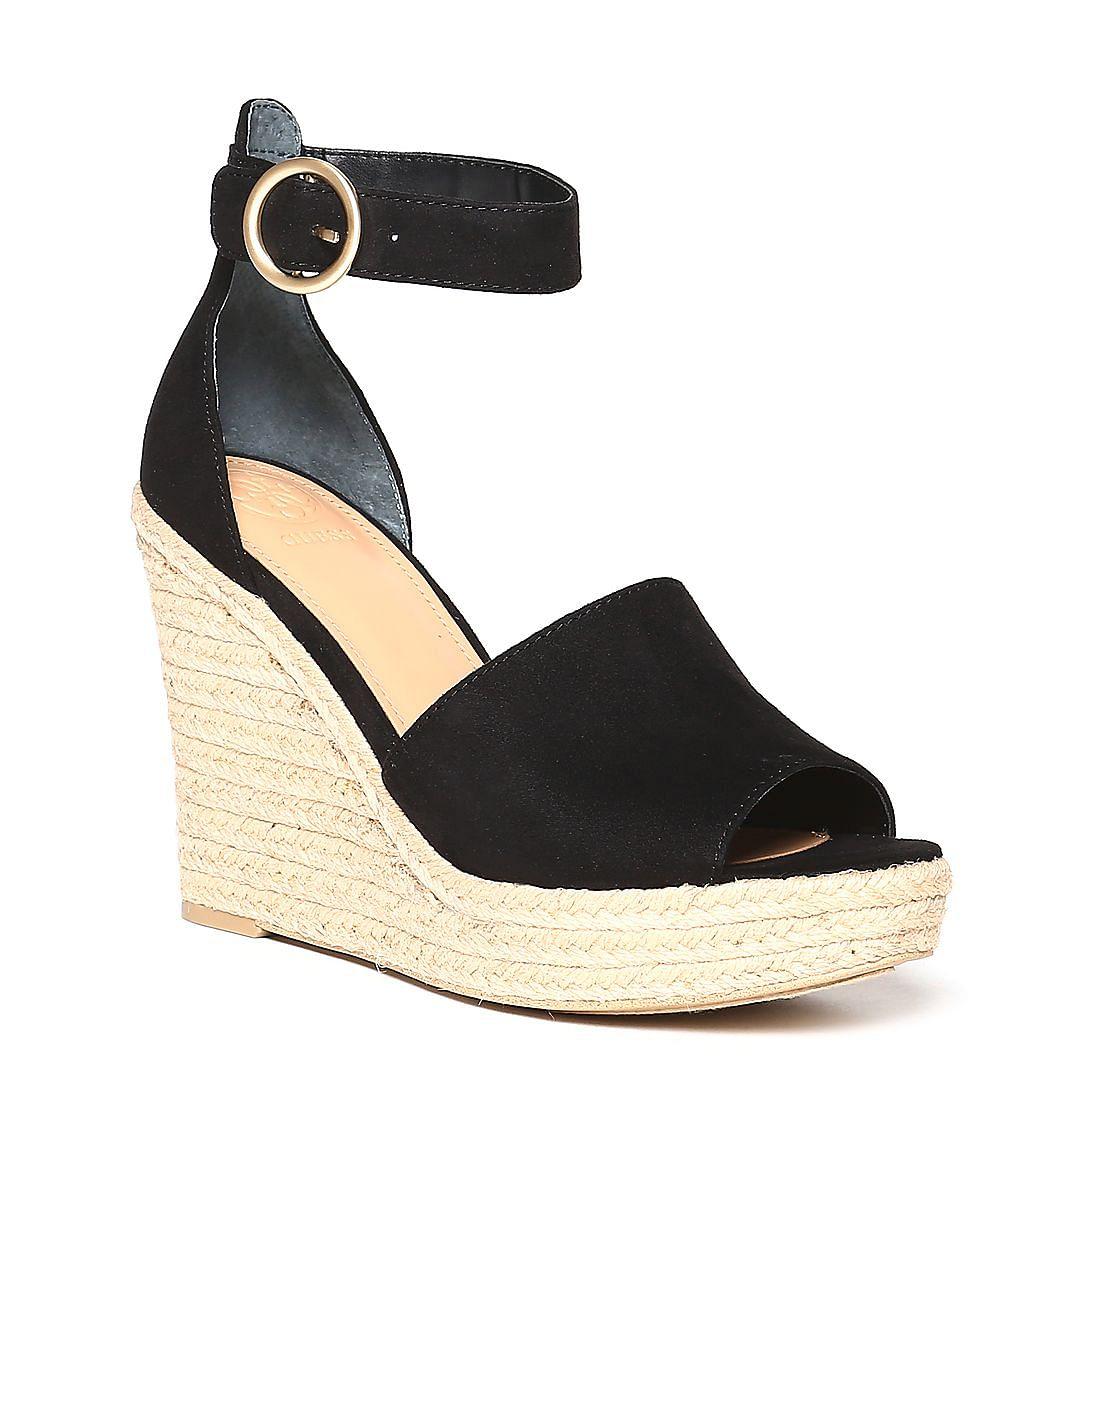 091c73310d6 Buy Women Espadrille Wedge Sandlas online at NNNOW.com